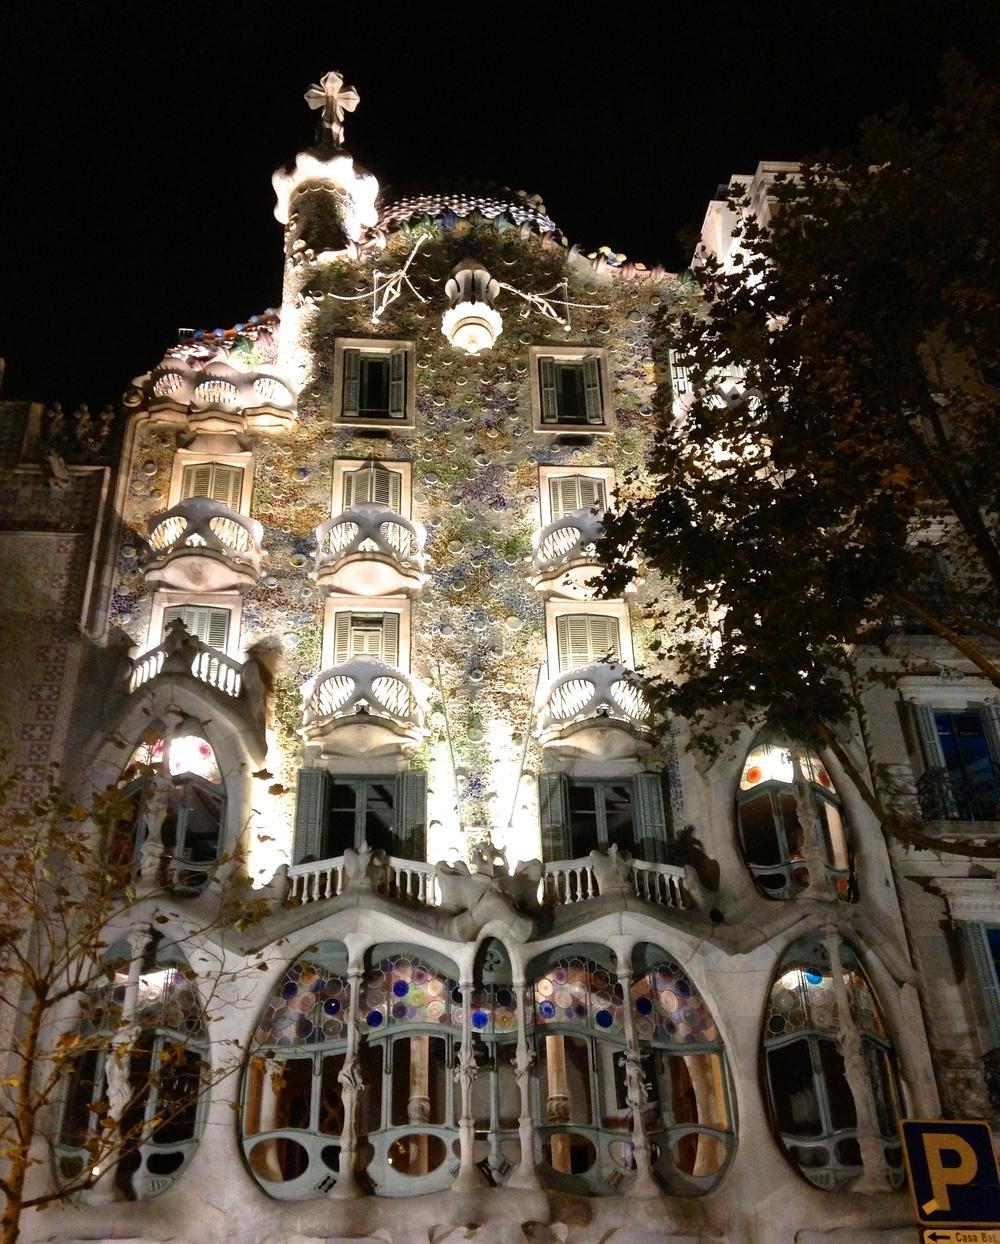 Casa Batlló, my favorite work of Antoni Gaudí